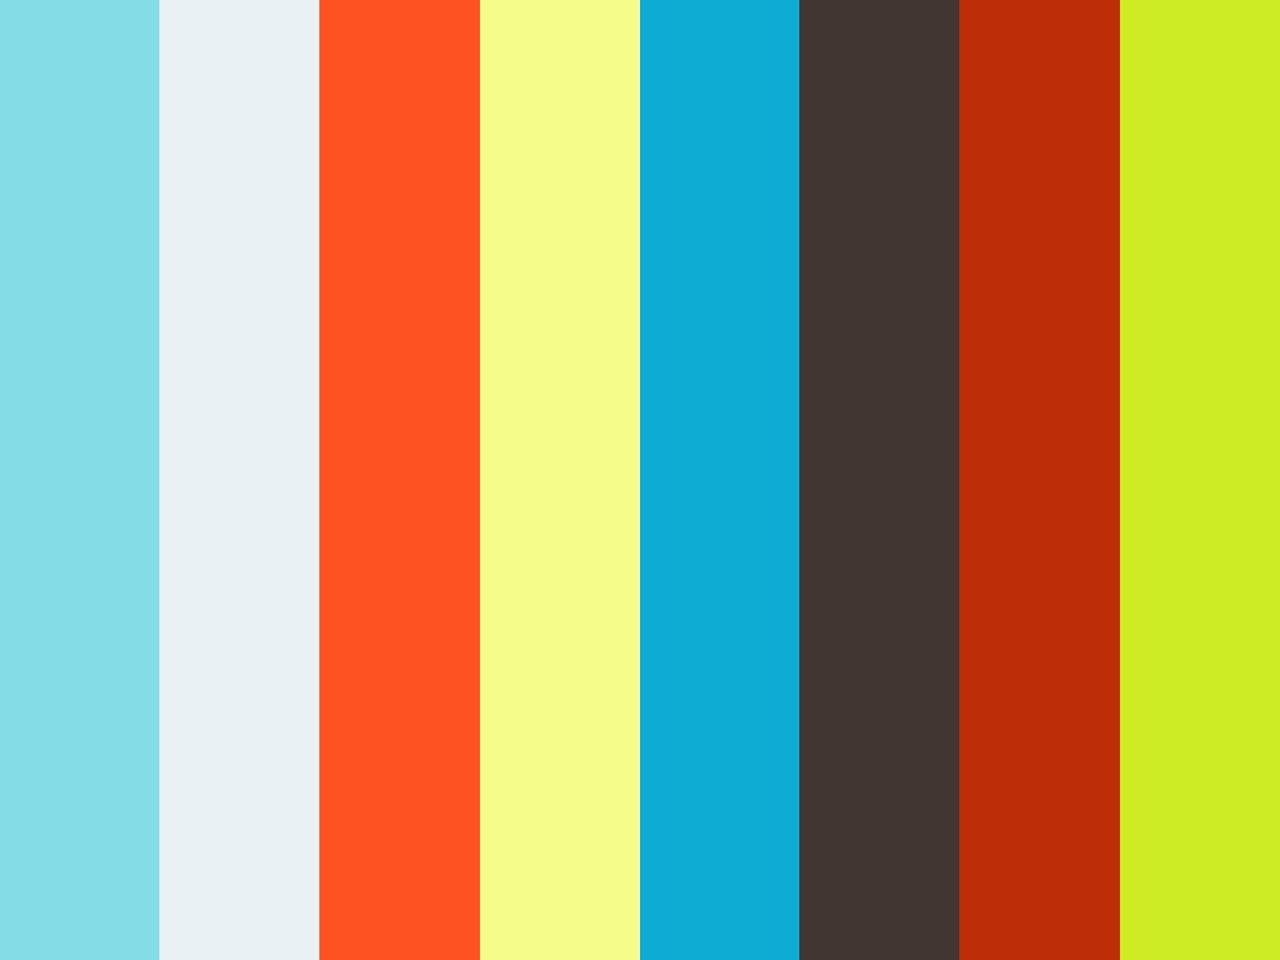 002735 - CORP - Ohlala BehaKlas - Tip 07 - Bustier